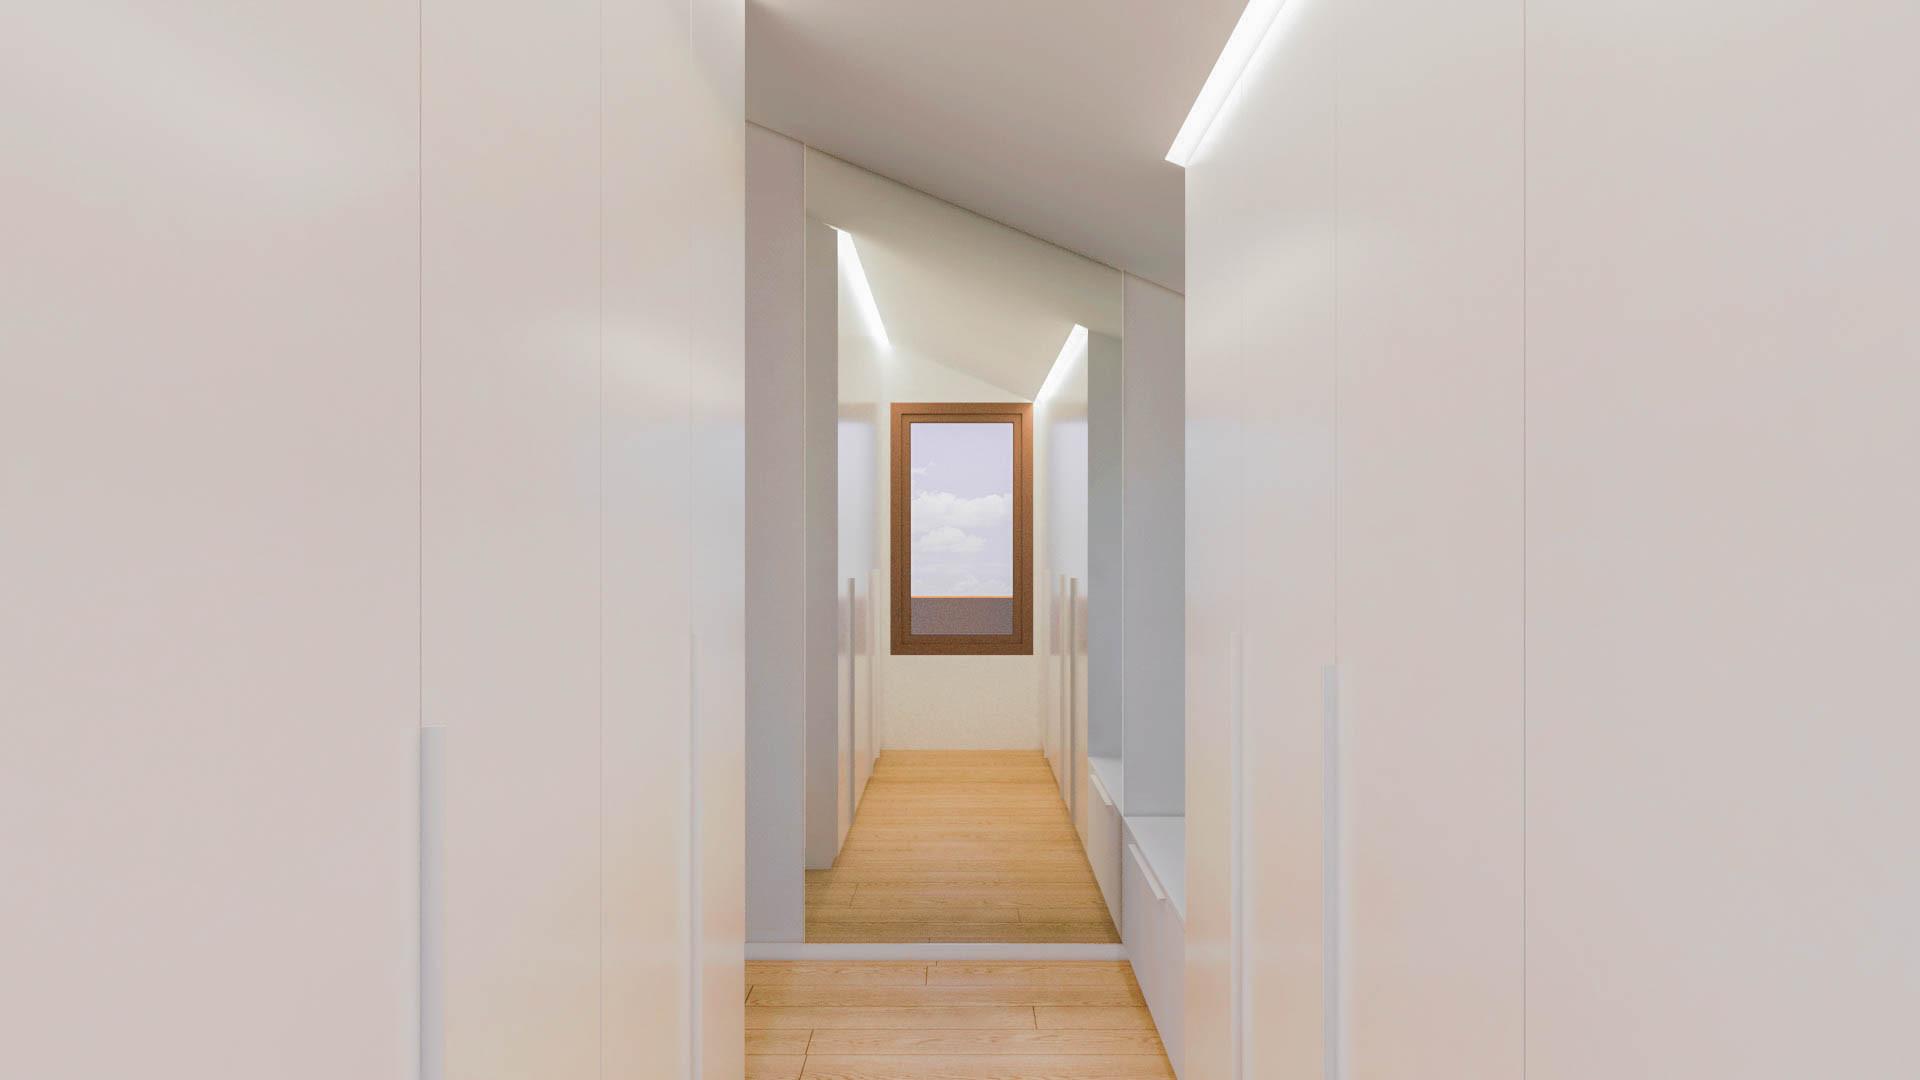 arquitectura-senmais-20.01.07.jpg